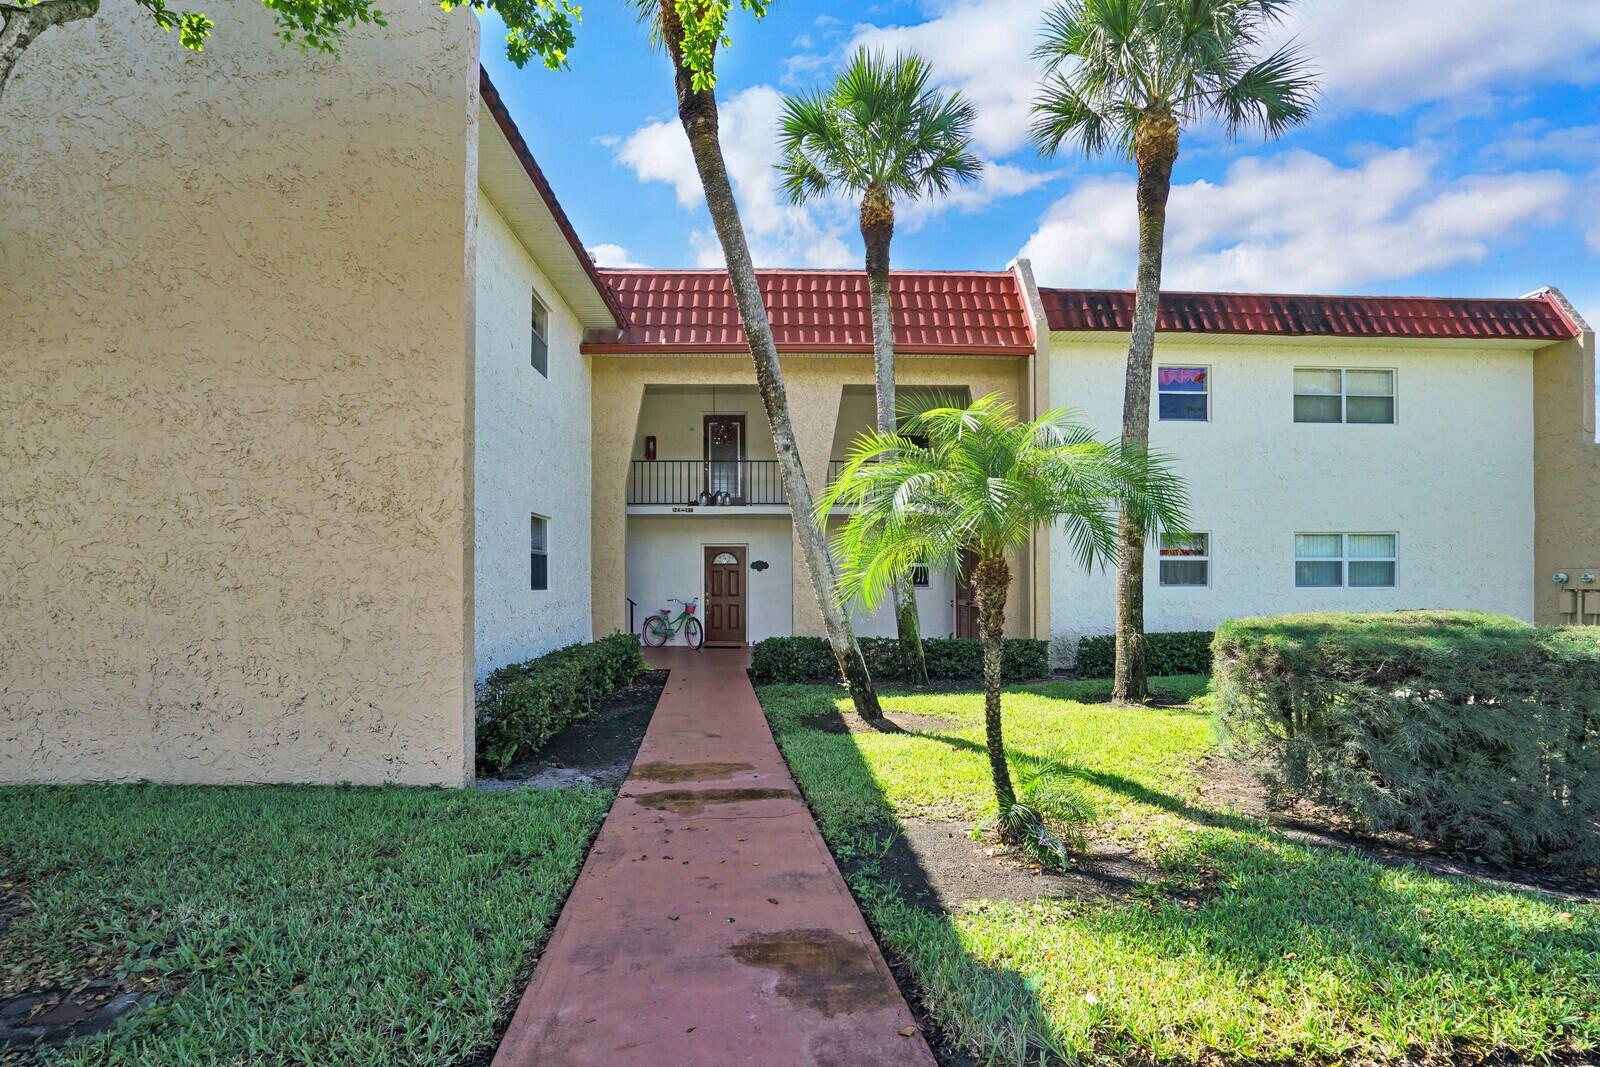 128 Lake Evelyn Drive, West Palm Beach, FL 33411 - MLS#: RX-10750206